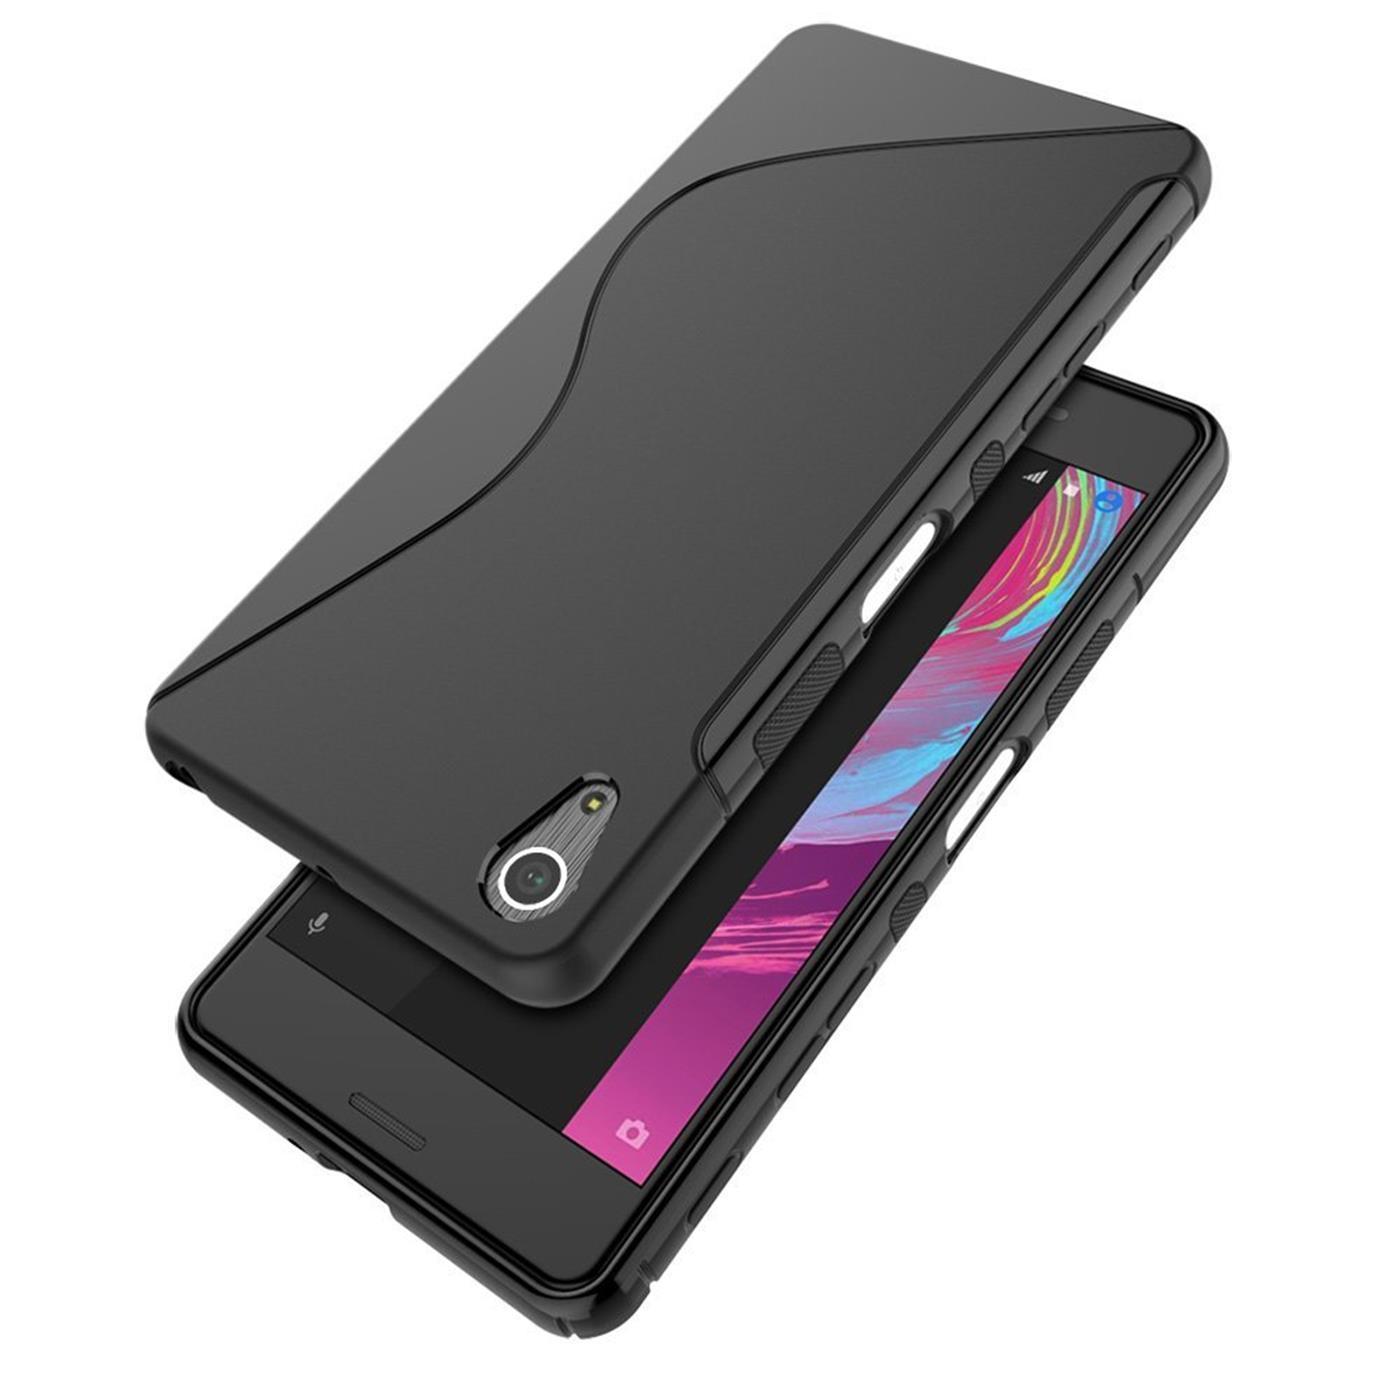 Sony-Xperia-X-Silikon-Gel-S-Line-Case-Cover-Ultra-Thin-Slim-Back-Bumper Indexbild 20